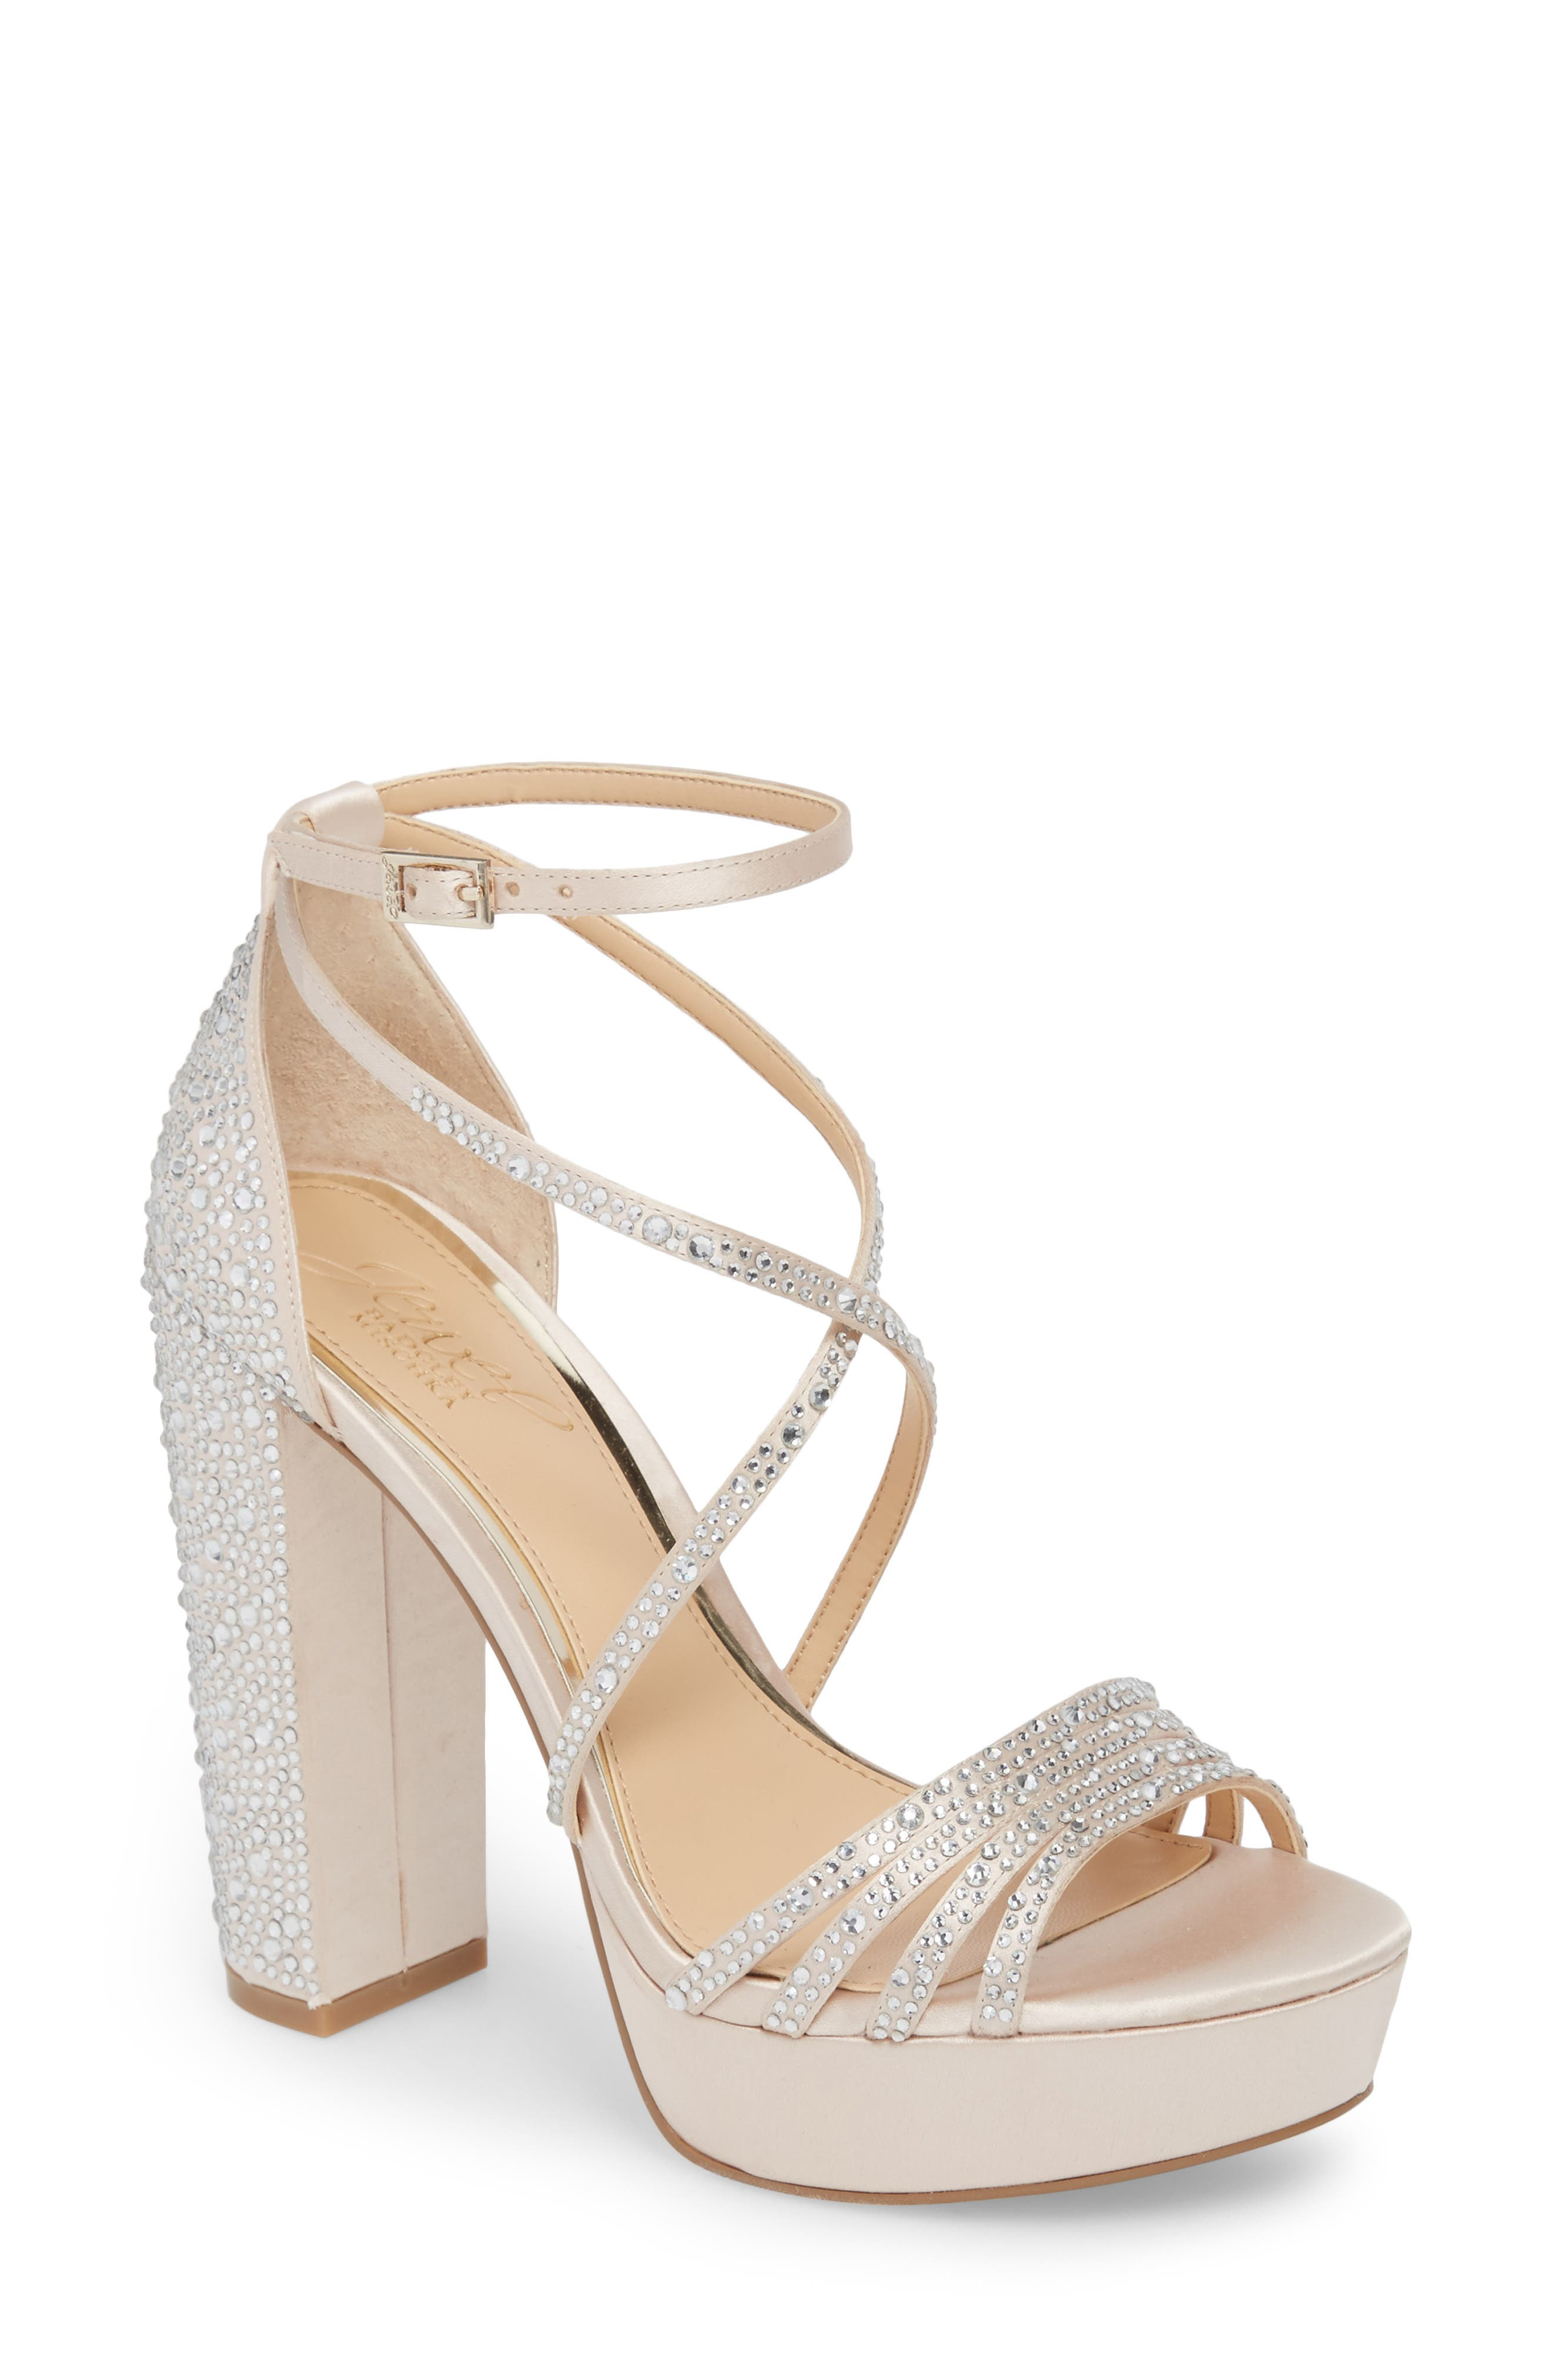 Tarah Crystal Embellished Platform Sandal,                             Main thumbnail 1, color,                             Champagne Satin